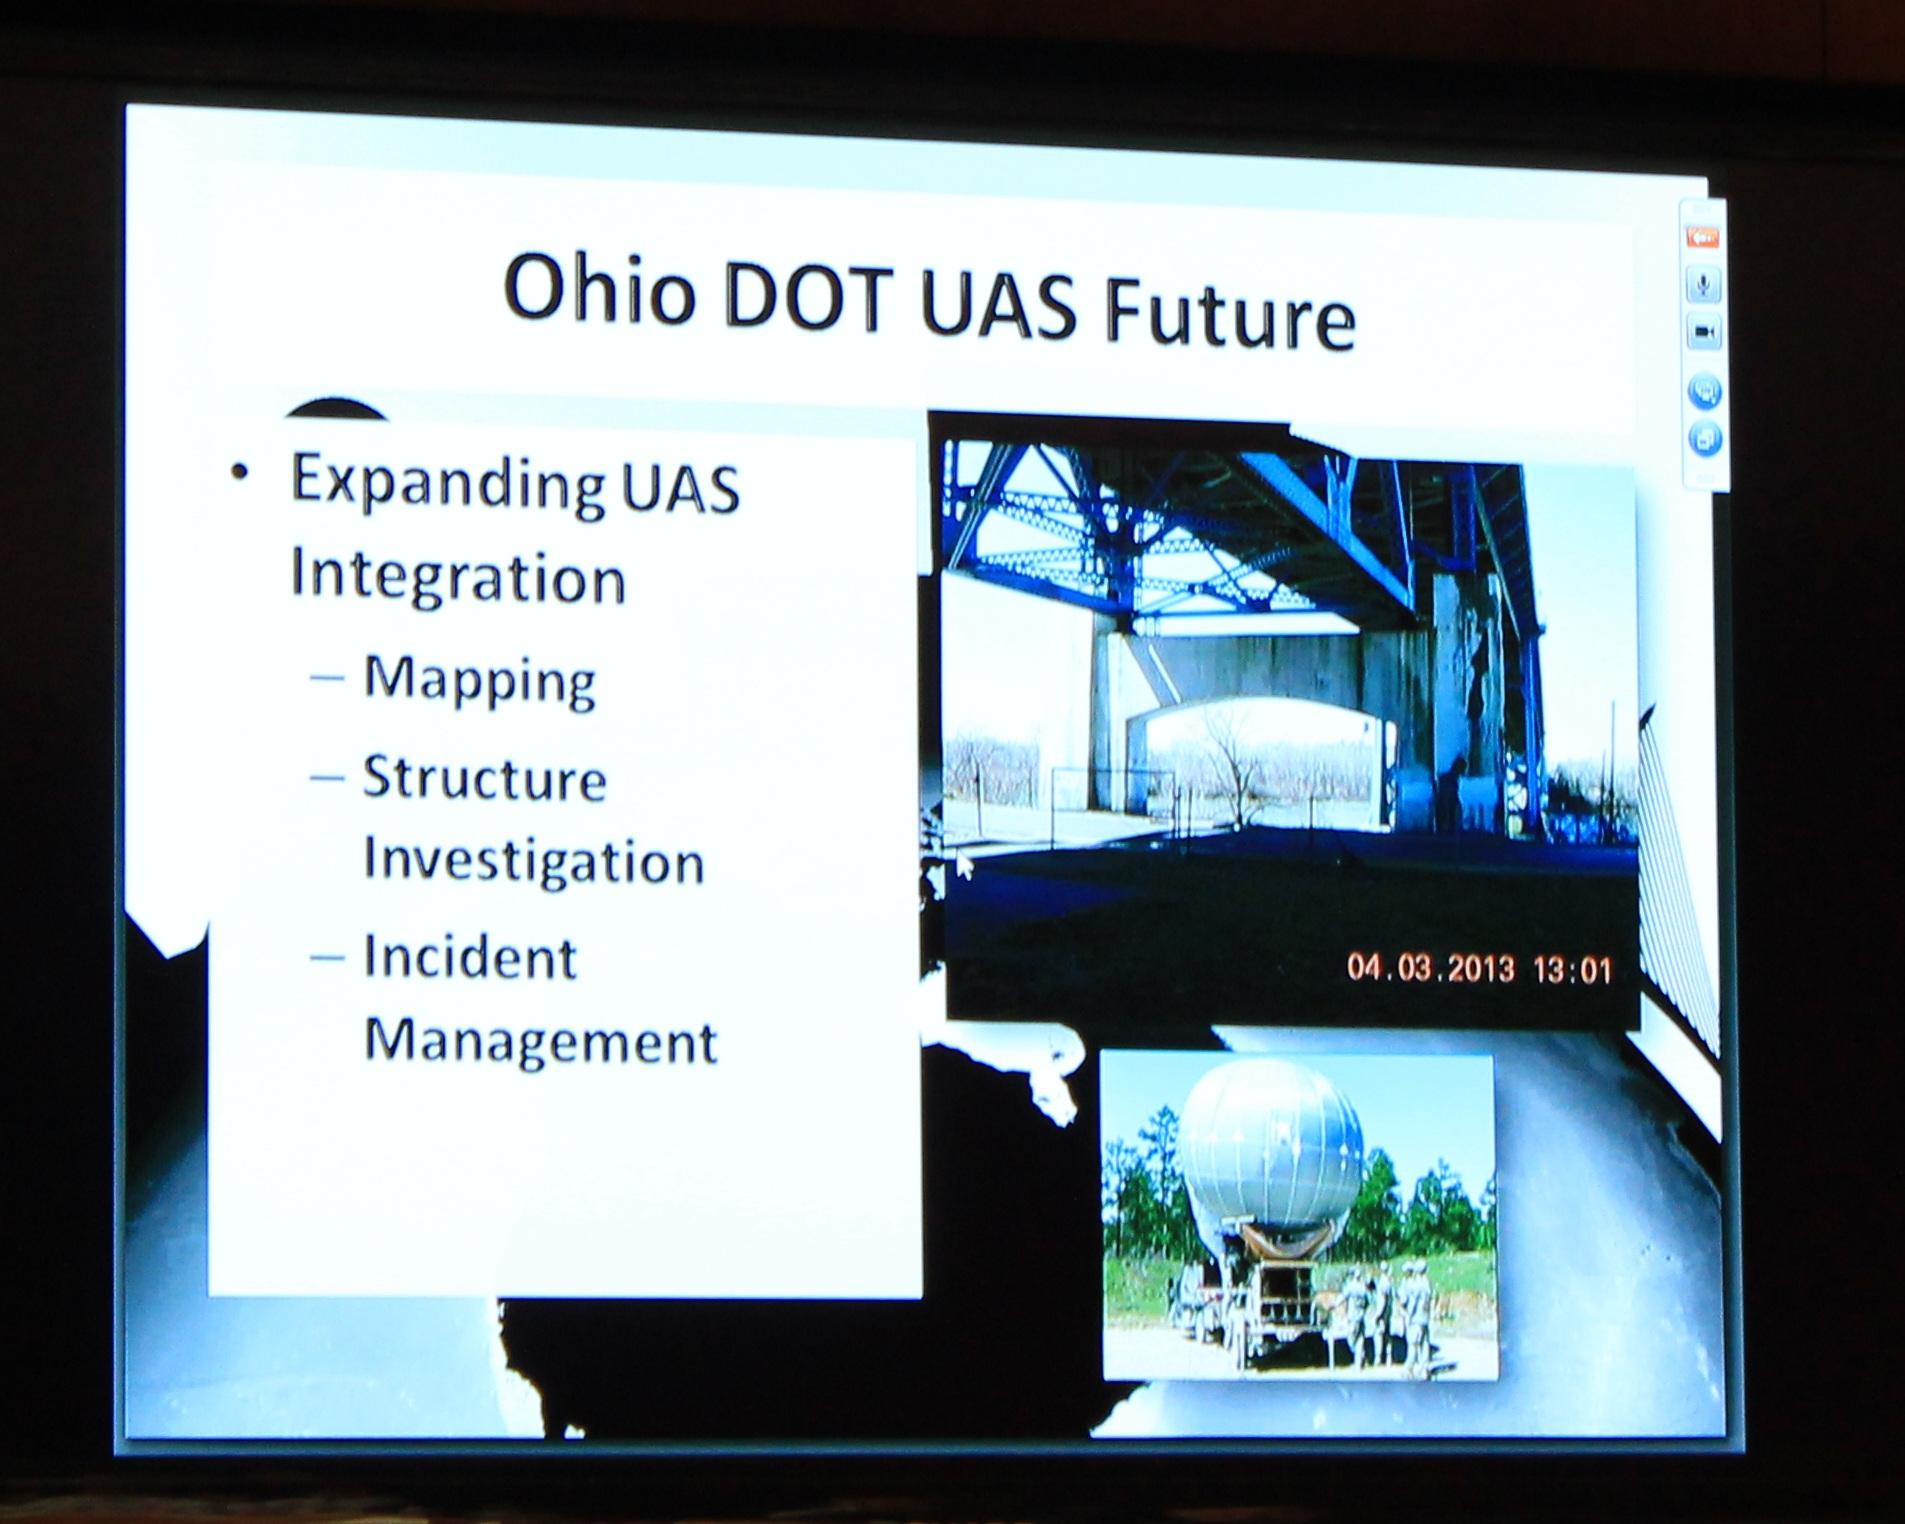 Ohio DOT UAS